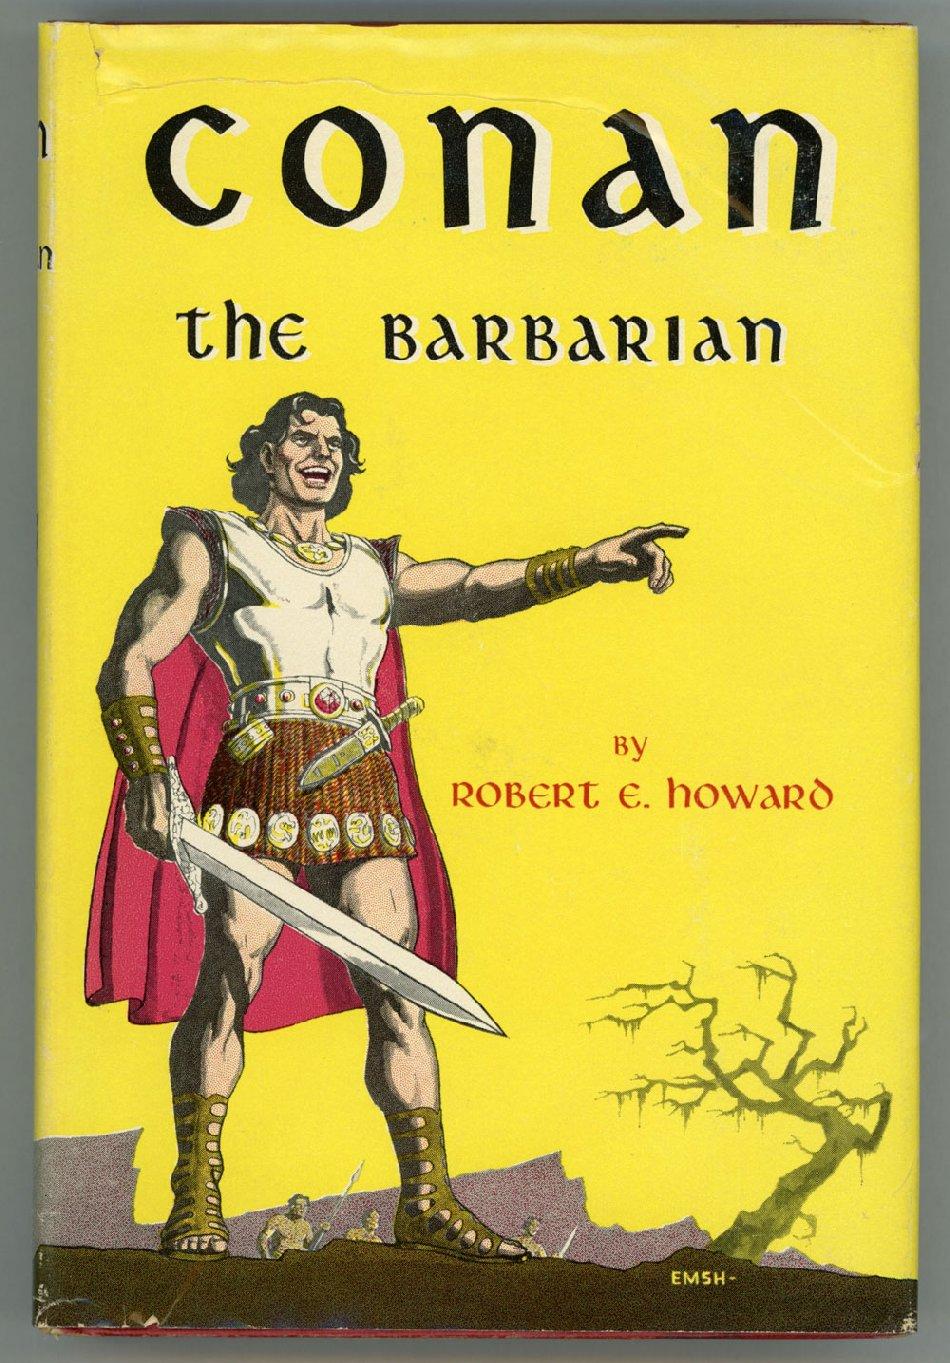 No Barbarian, No Barbarian, you're the Barbarian!